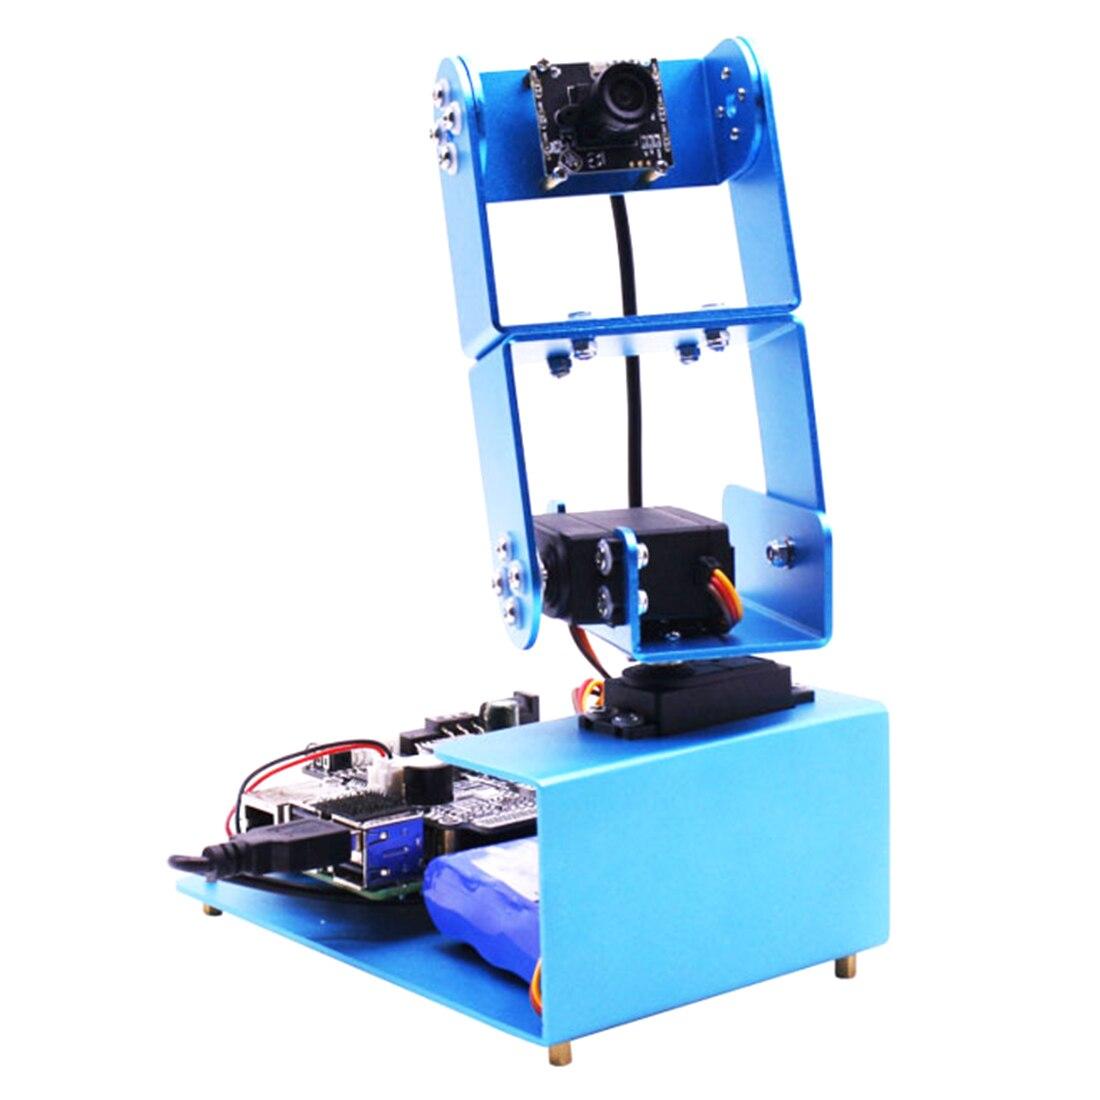 Modiker High Tech Toys AI Camera Gimbal Computer Vision Robot OpenCV Face Detector Kit With Raspberry 4B (1G/2G/4G)